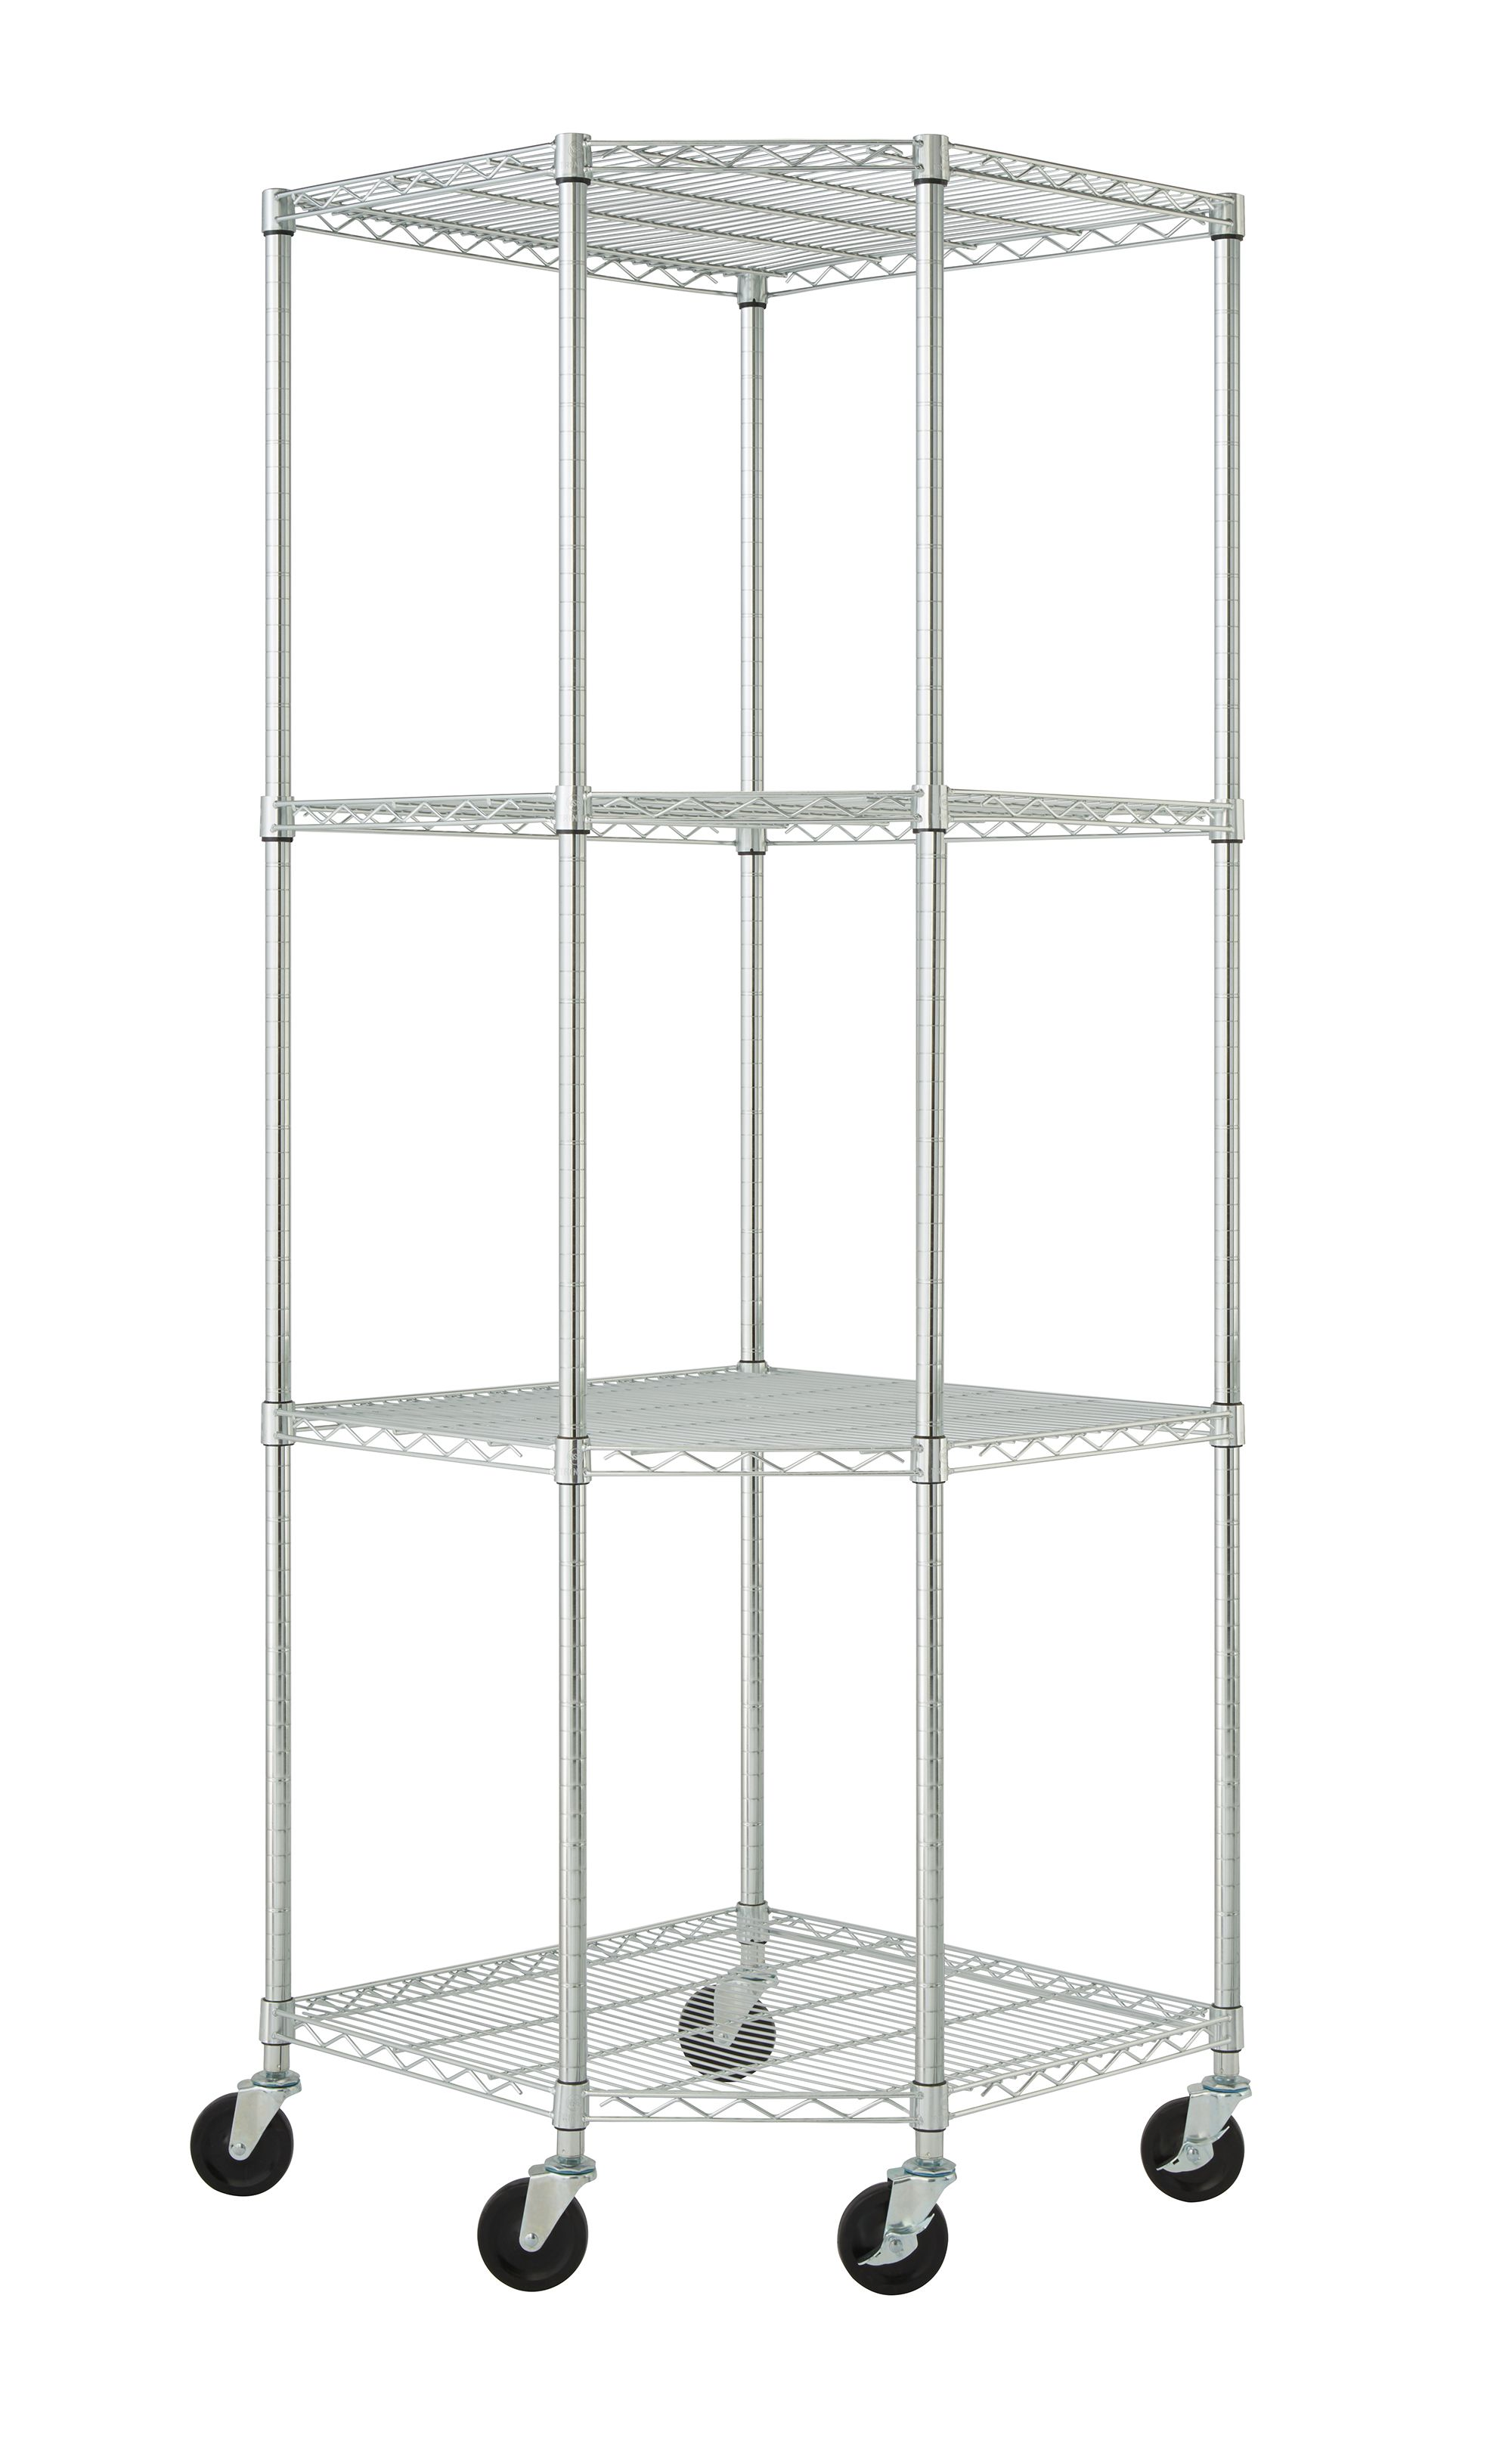 Pin On Shelves Ideas